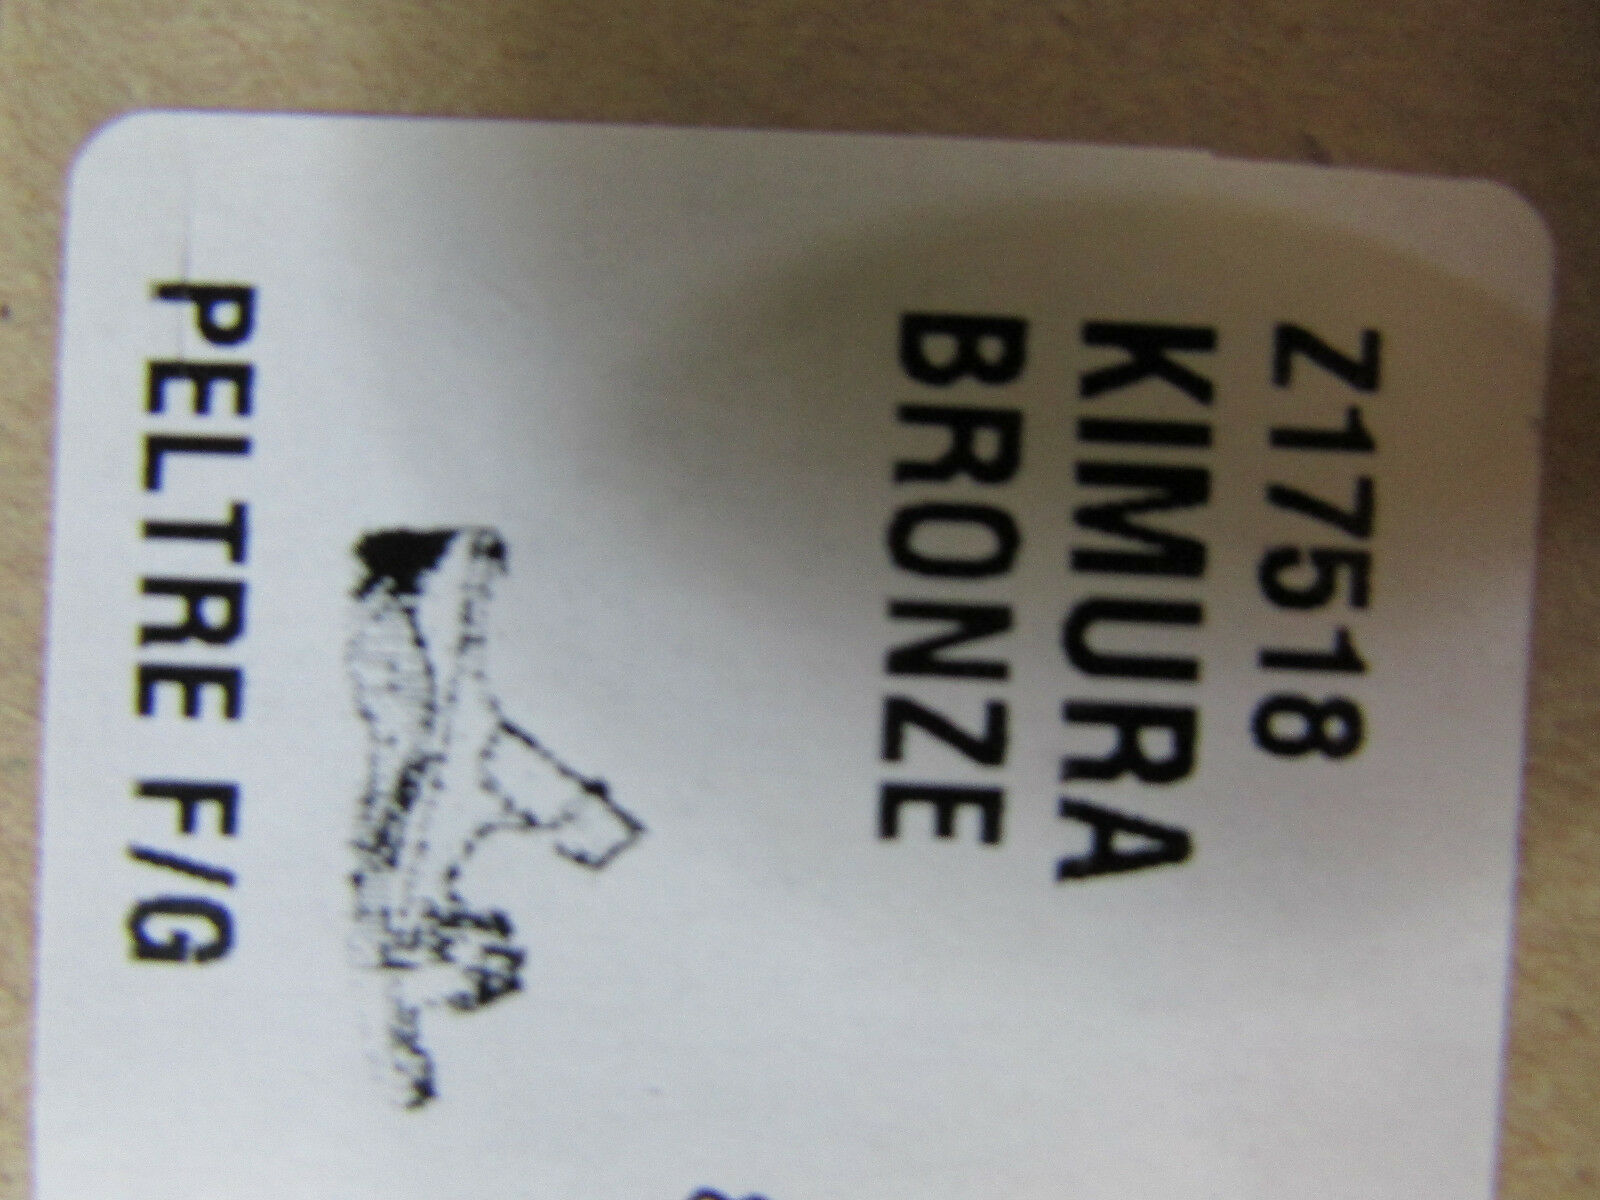 NEW B.O.C KIMURA BRONZE SANDALS Damenschuhe 8 SHIP SLIDES COMFORT SOLES FREE SHIP 8 33097f